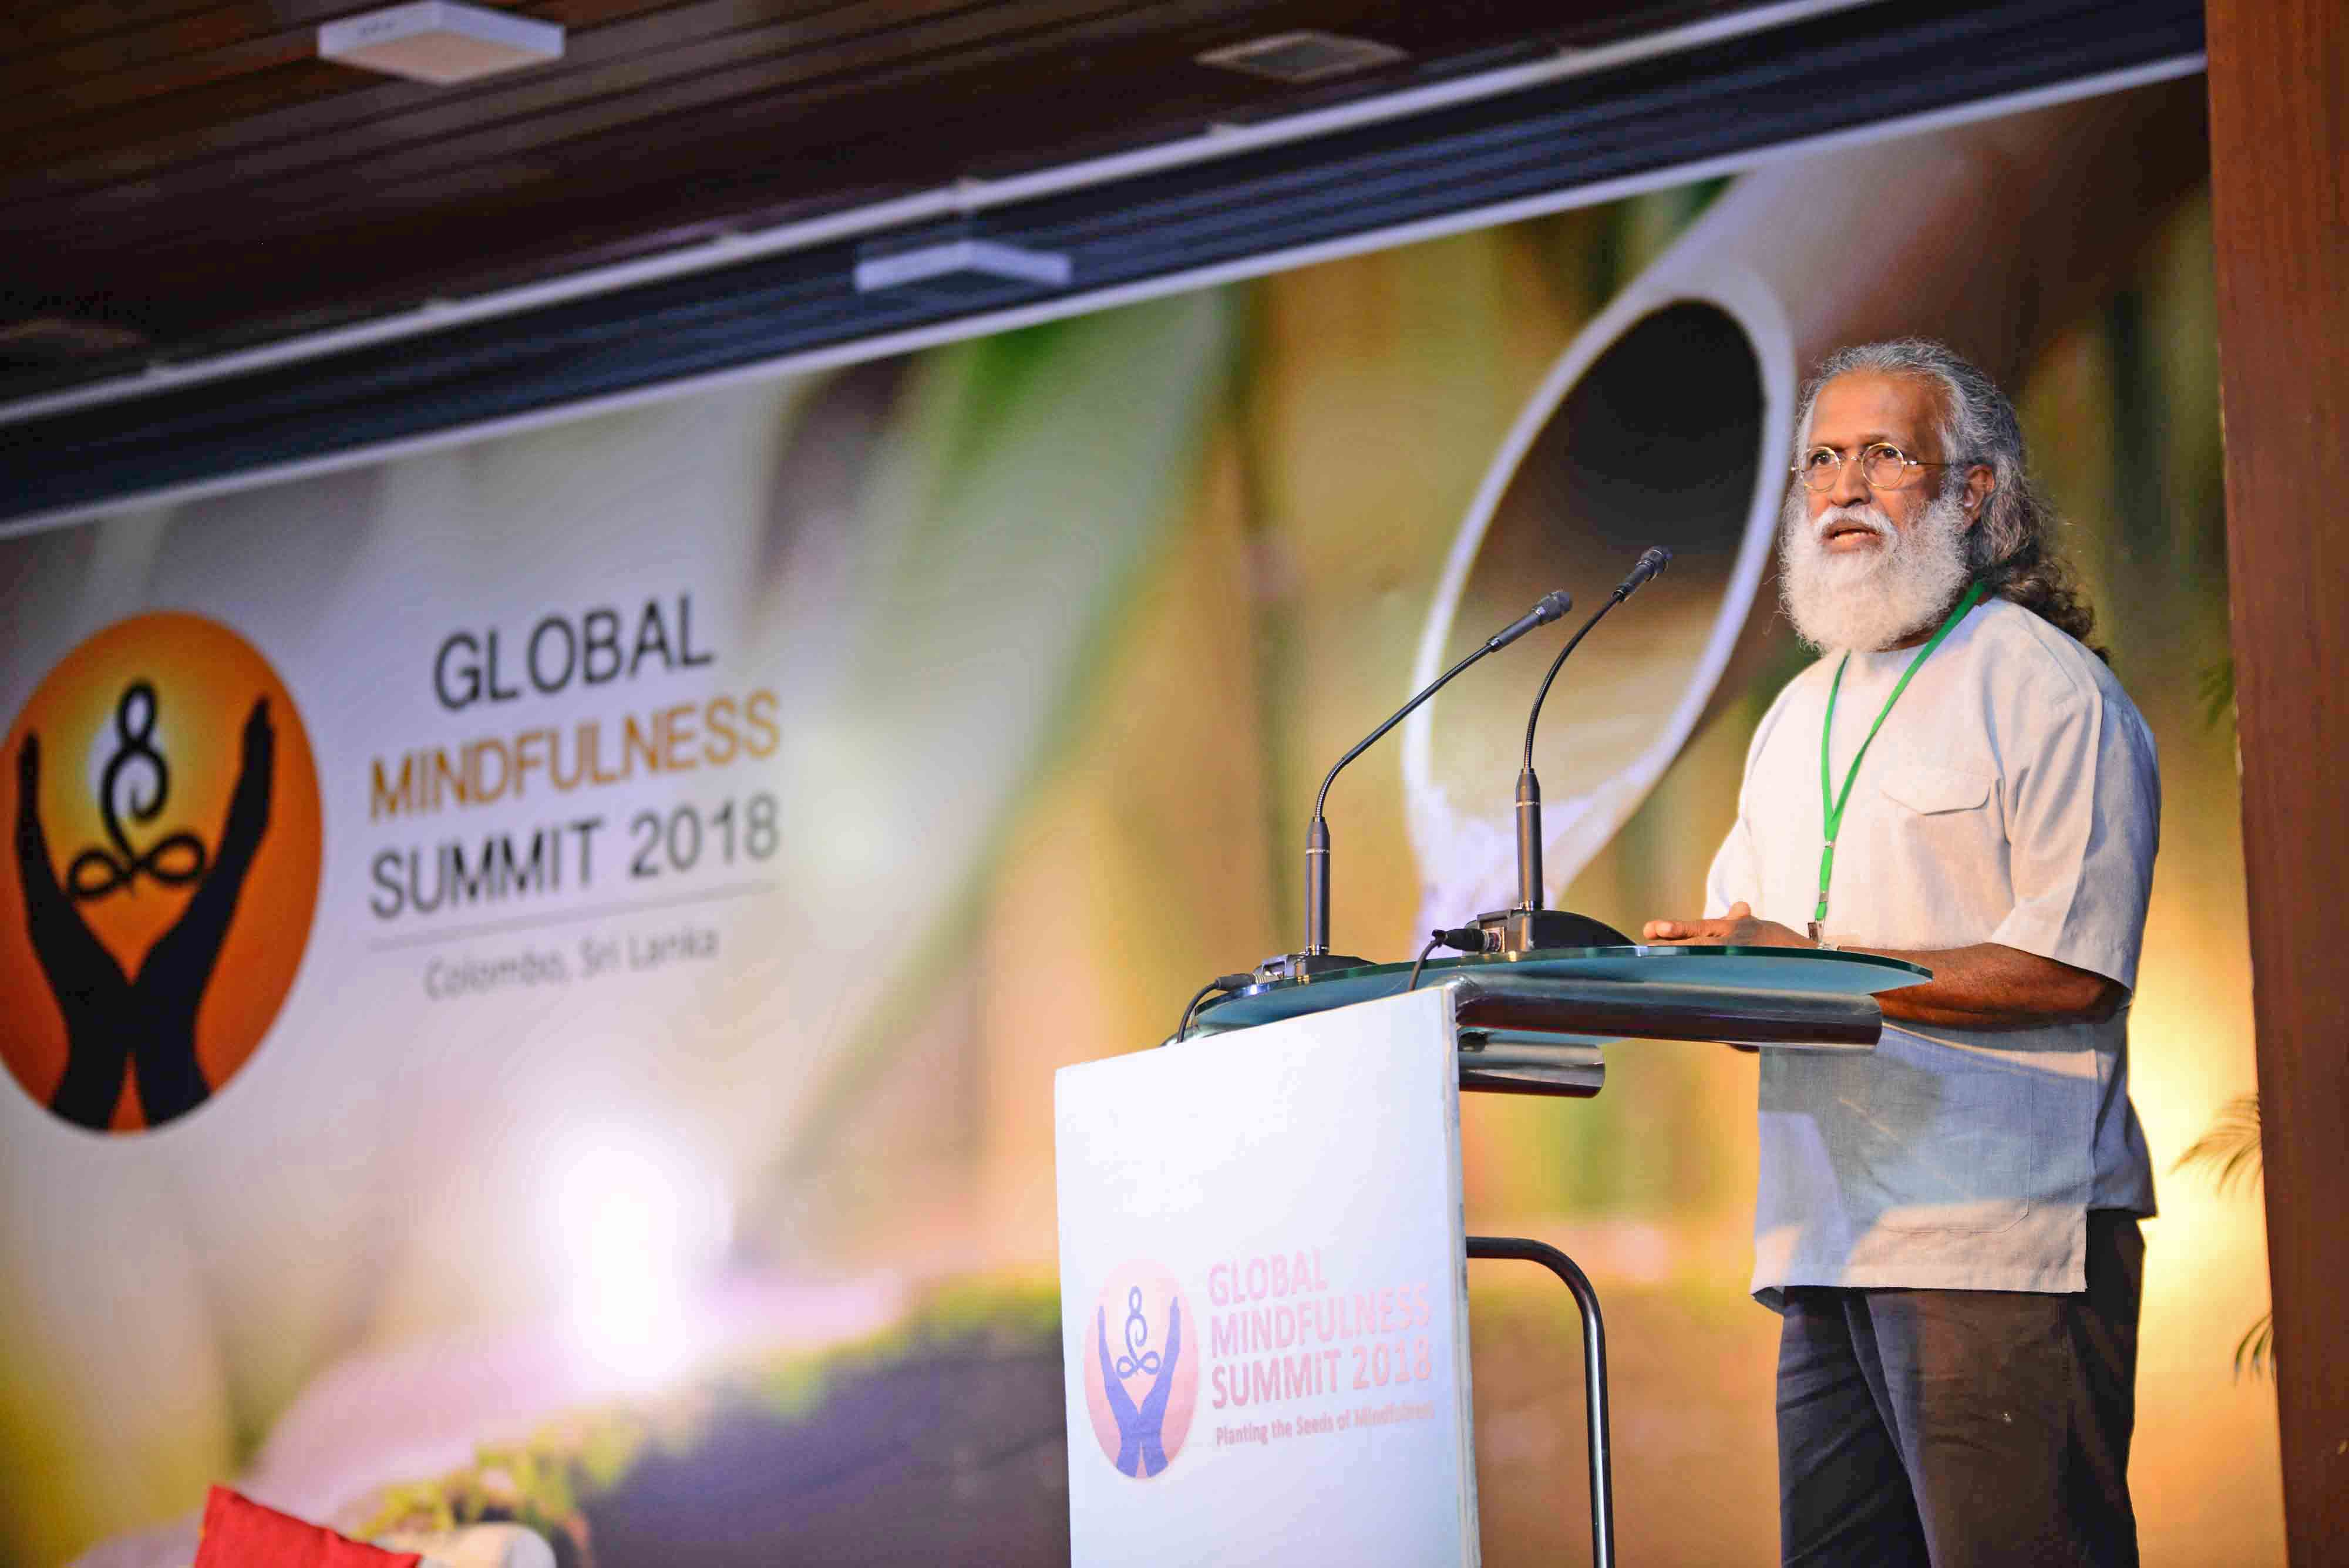 Global Mindfulness Summit 2018 - Day2 (47)